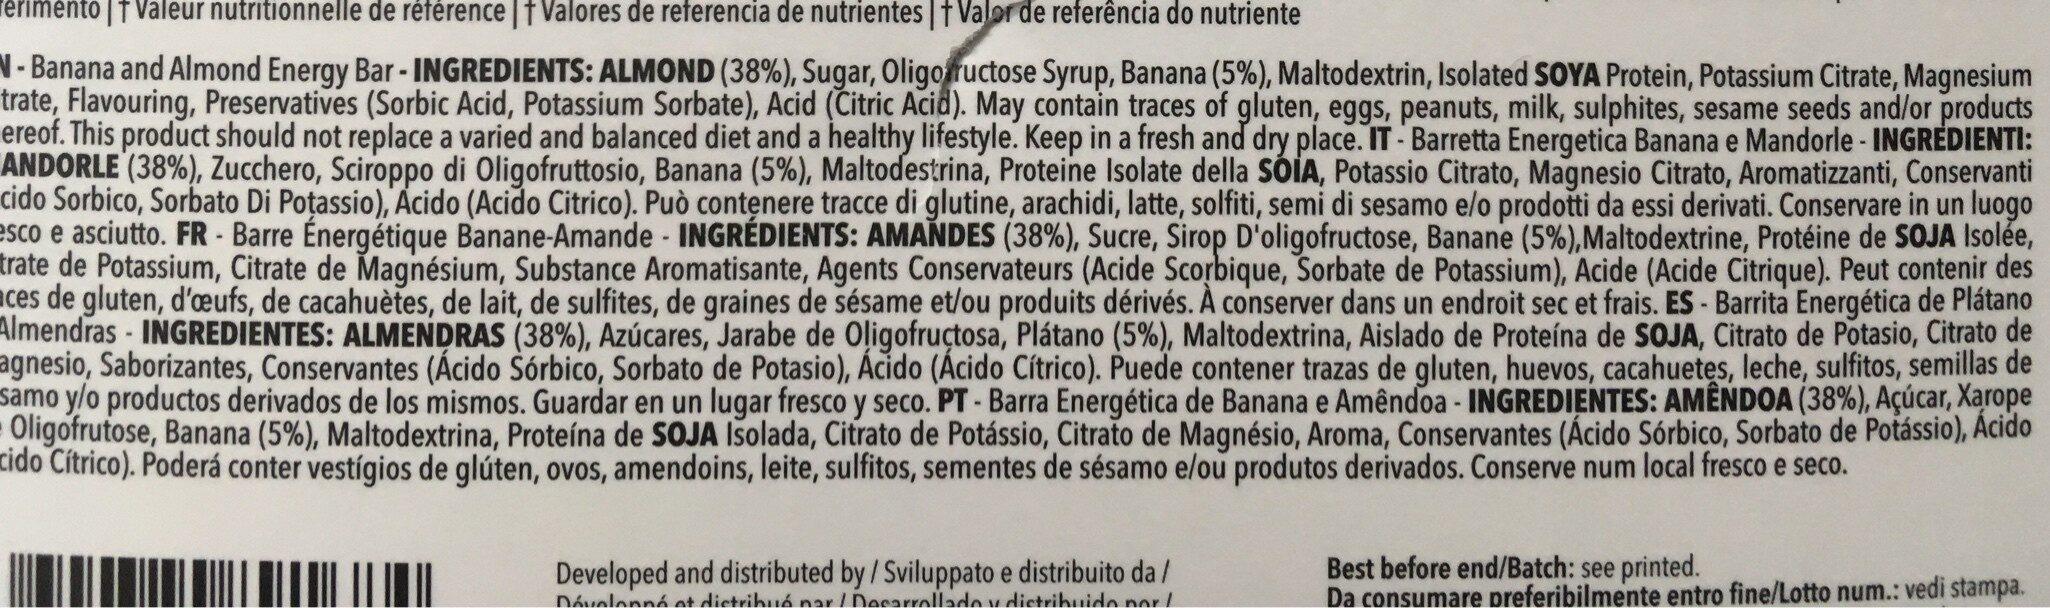 Prozis Energy Bar - Ingredients